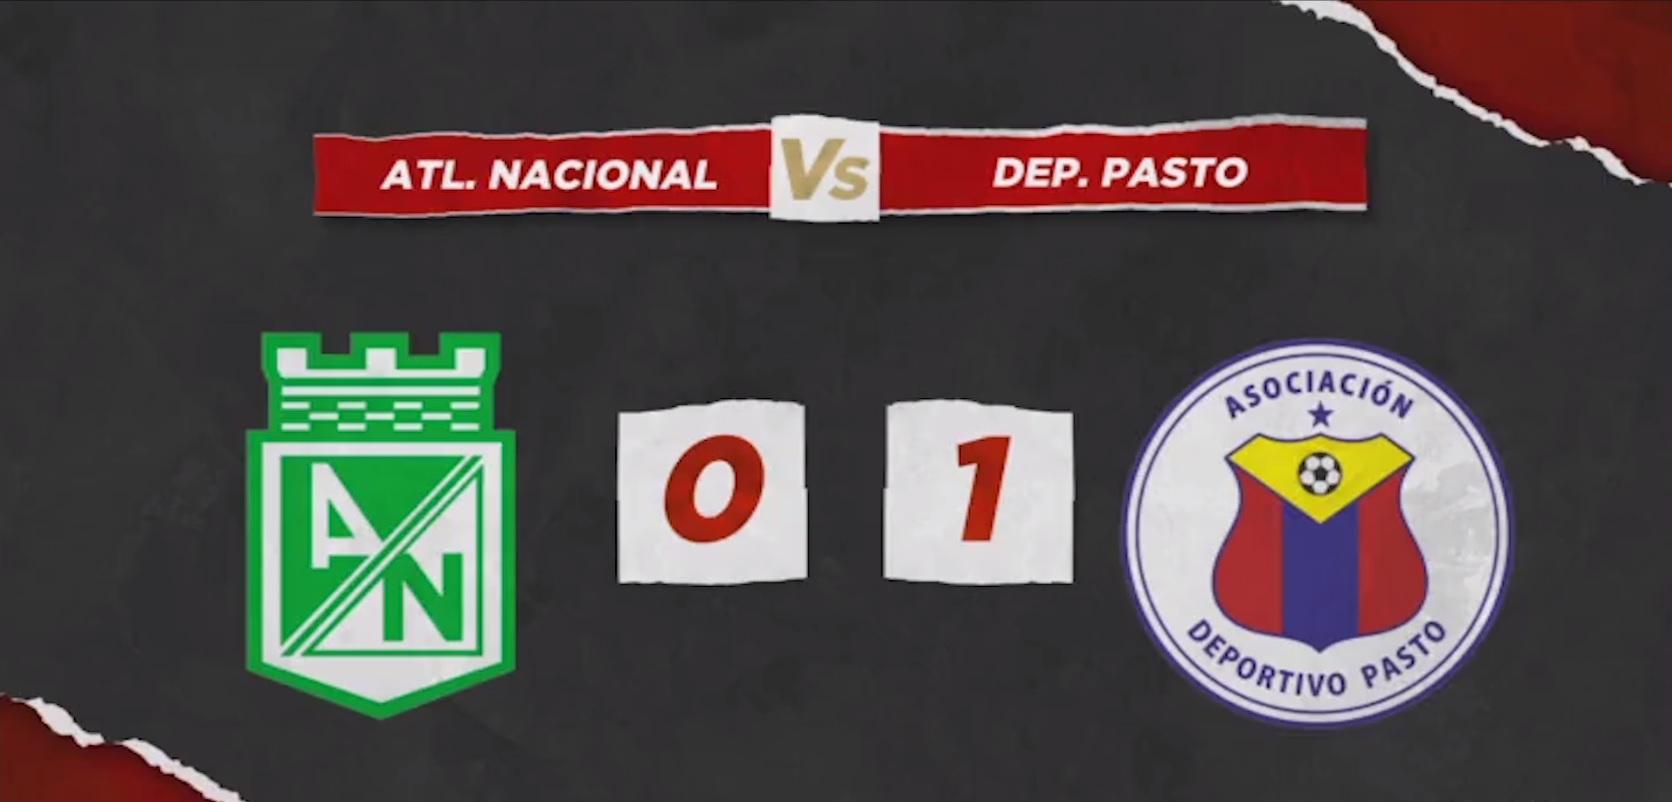 atletico-nacional-vs-deportivo-pasto.jpg